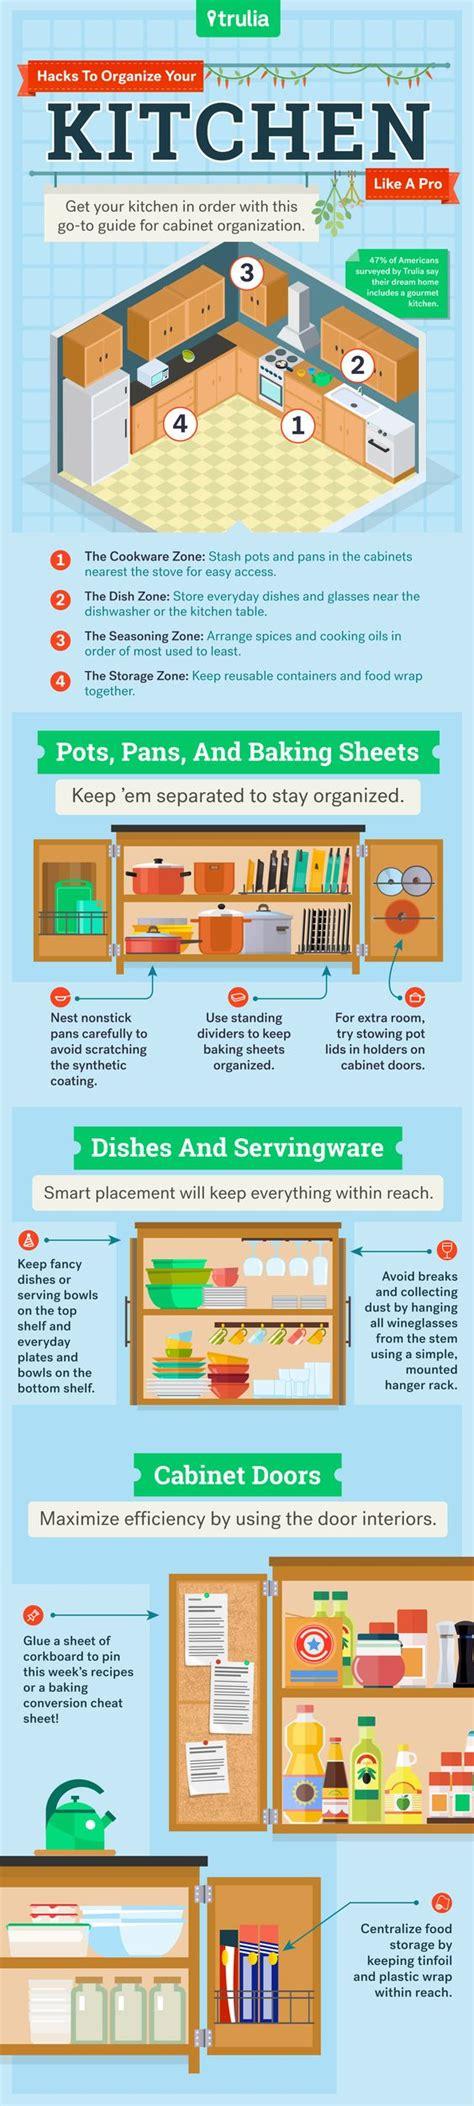 kitchen organization tips 14 ingenious kitchen organization tips infographic